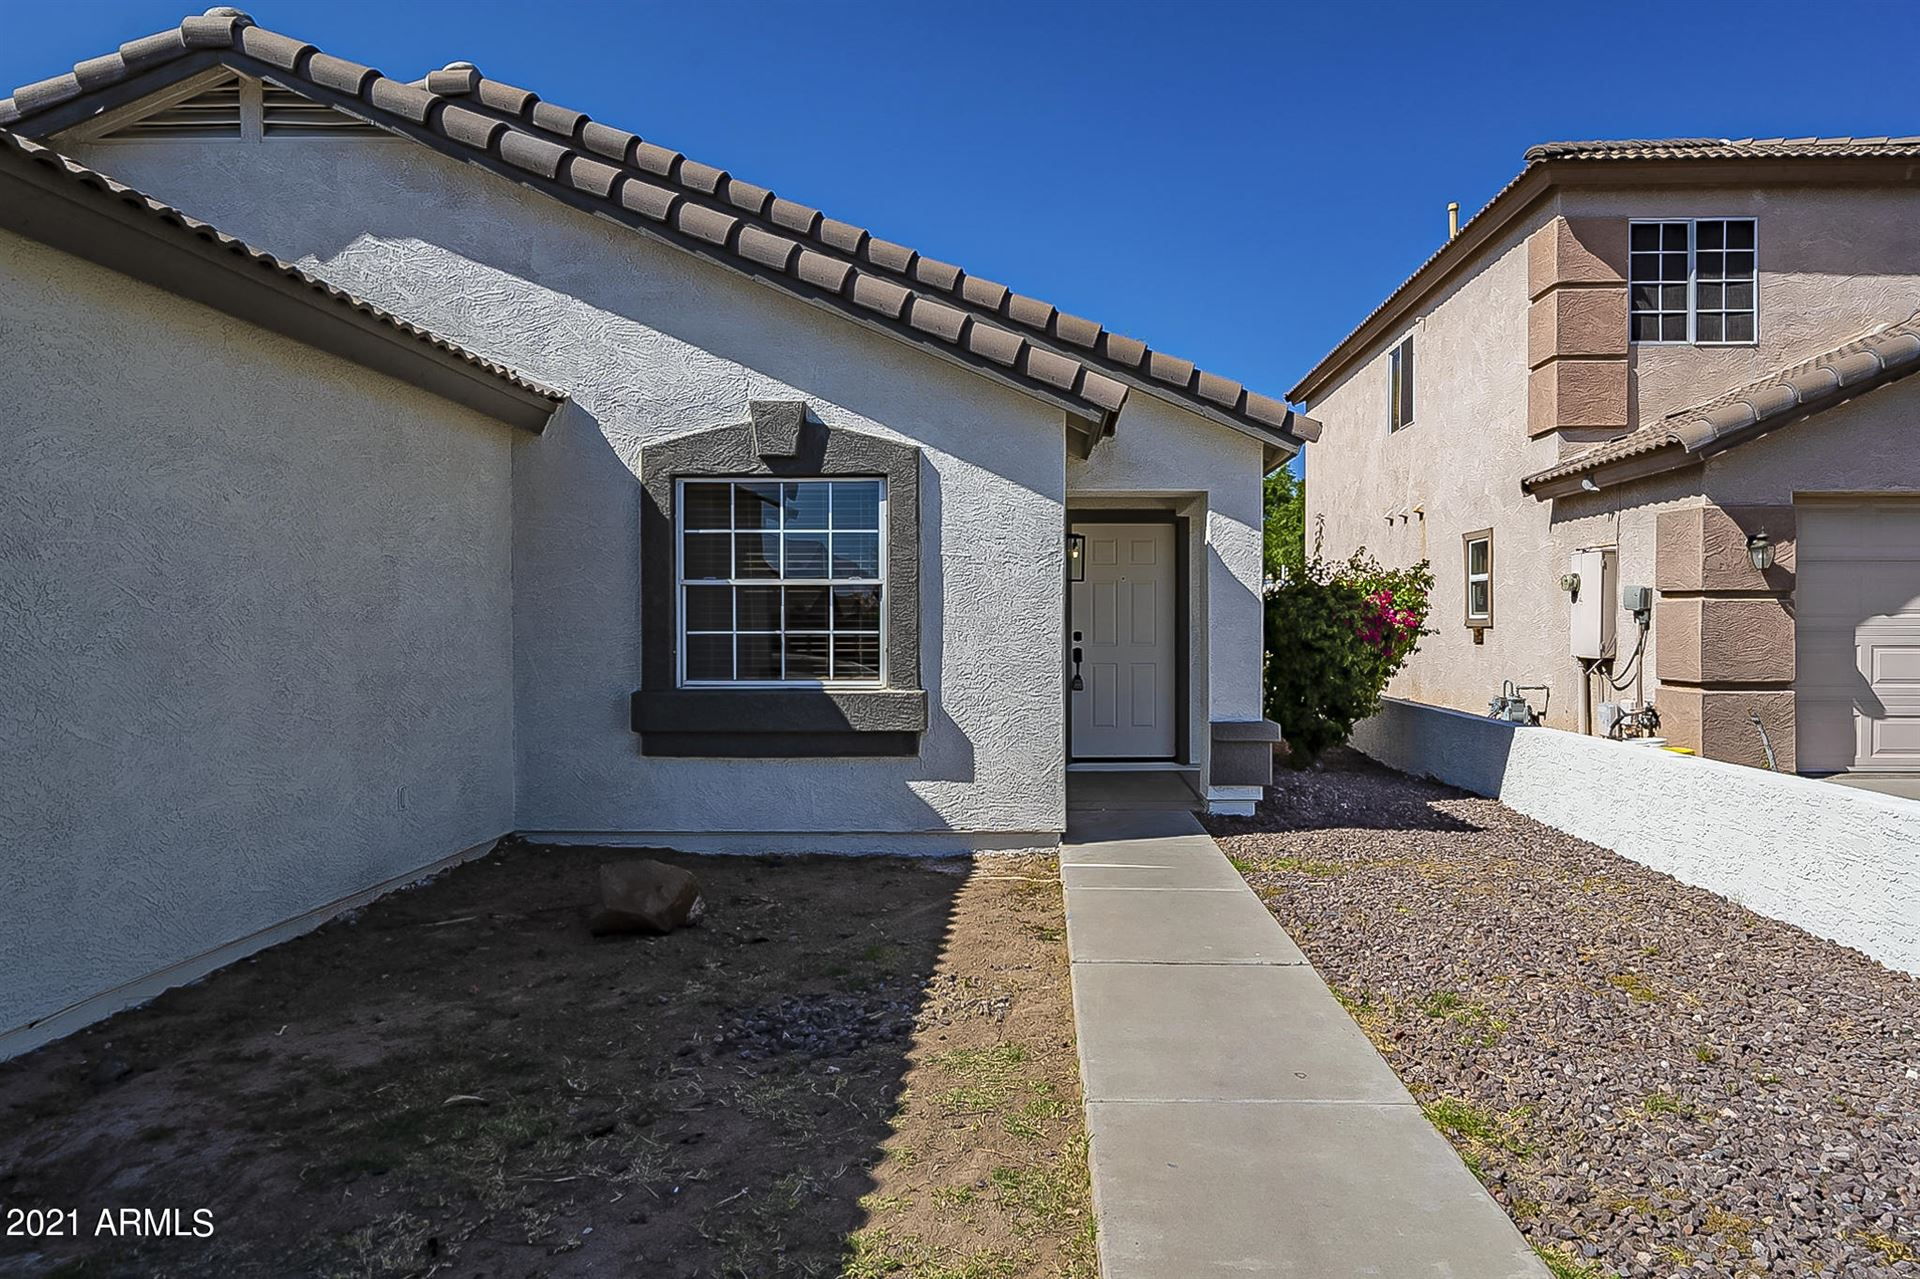 Photo of 12314 W PERSHING Street, El Mirage, AZ 85335 (MLS # 6227840)